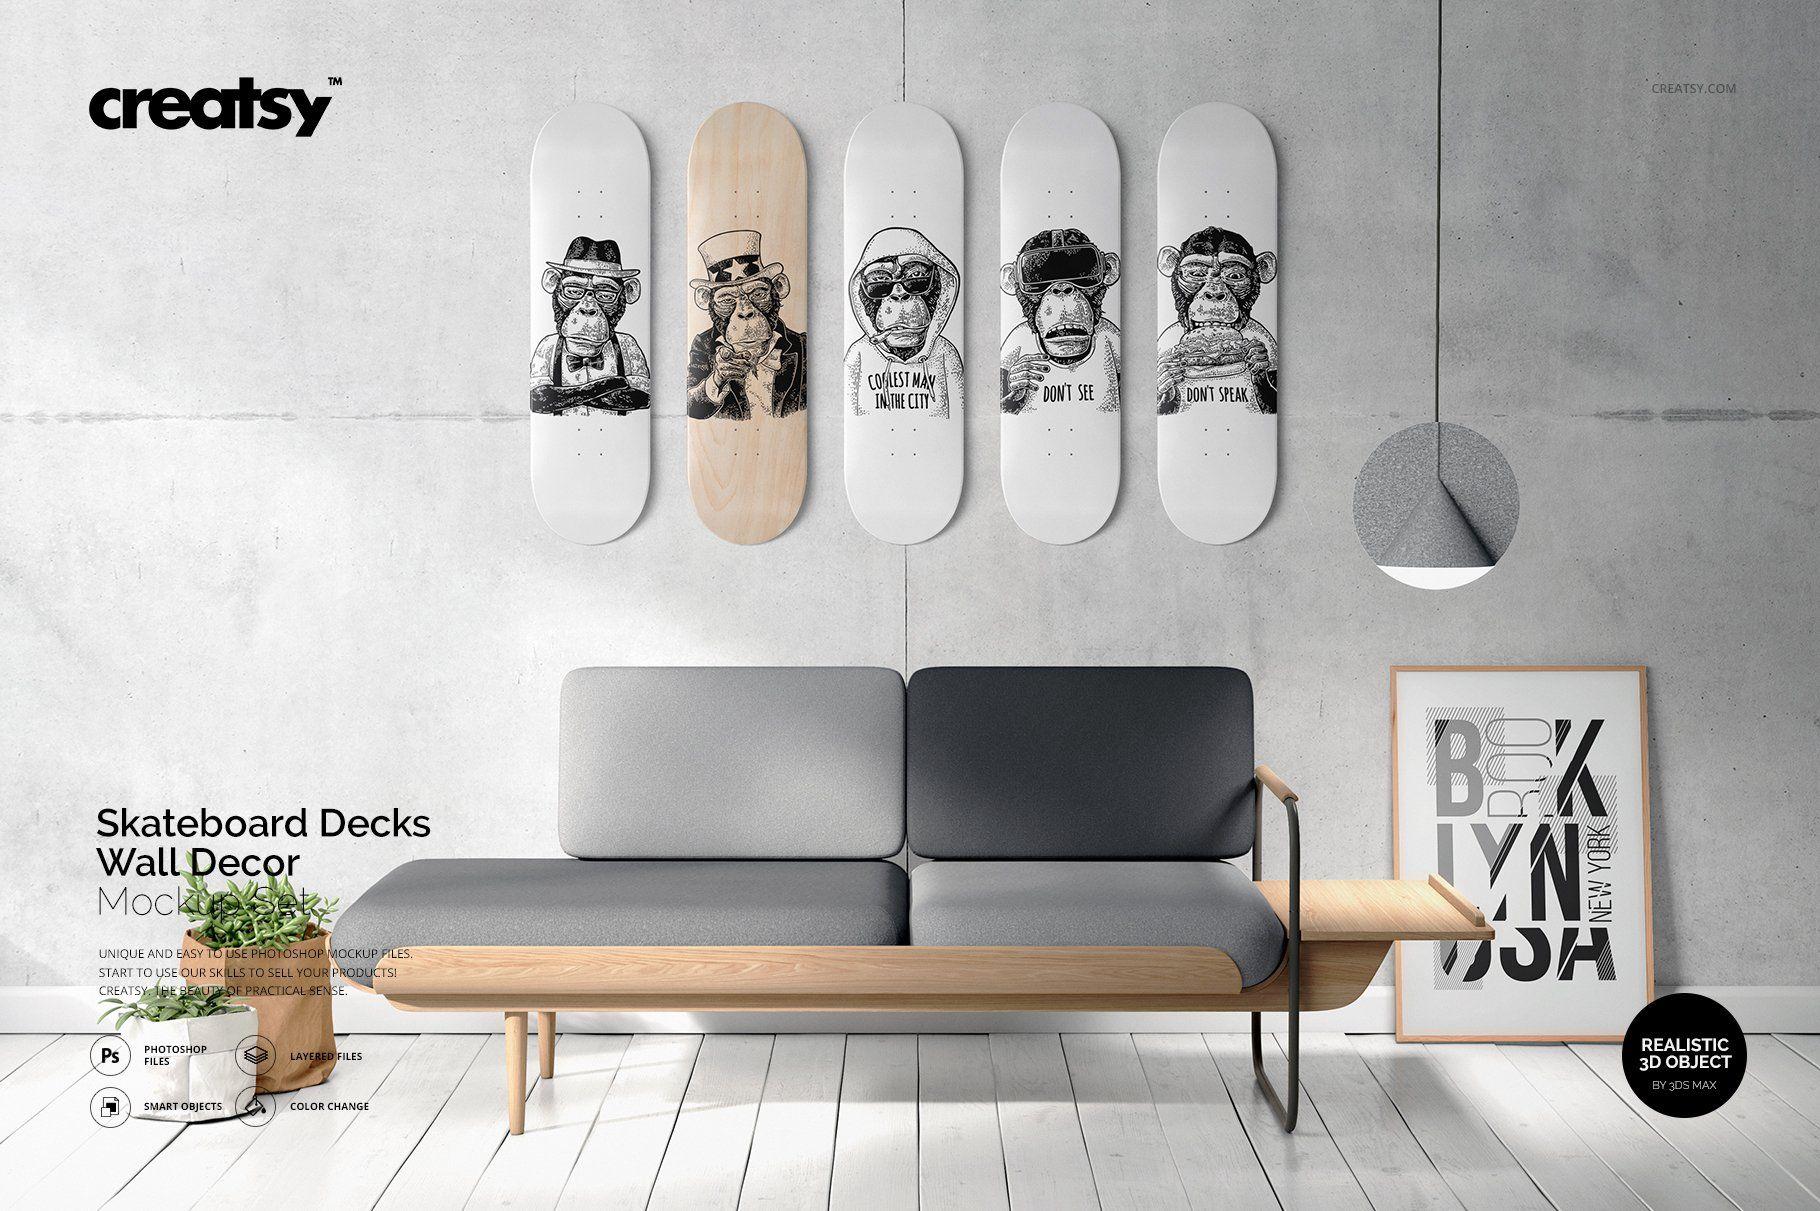 Skateboard Decks Wall Art Mockup Skateboard Wall Art Skateboard Decor Wall Decor